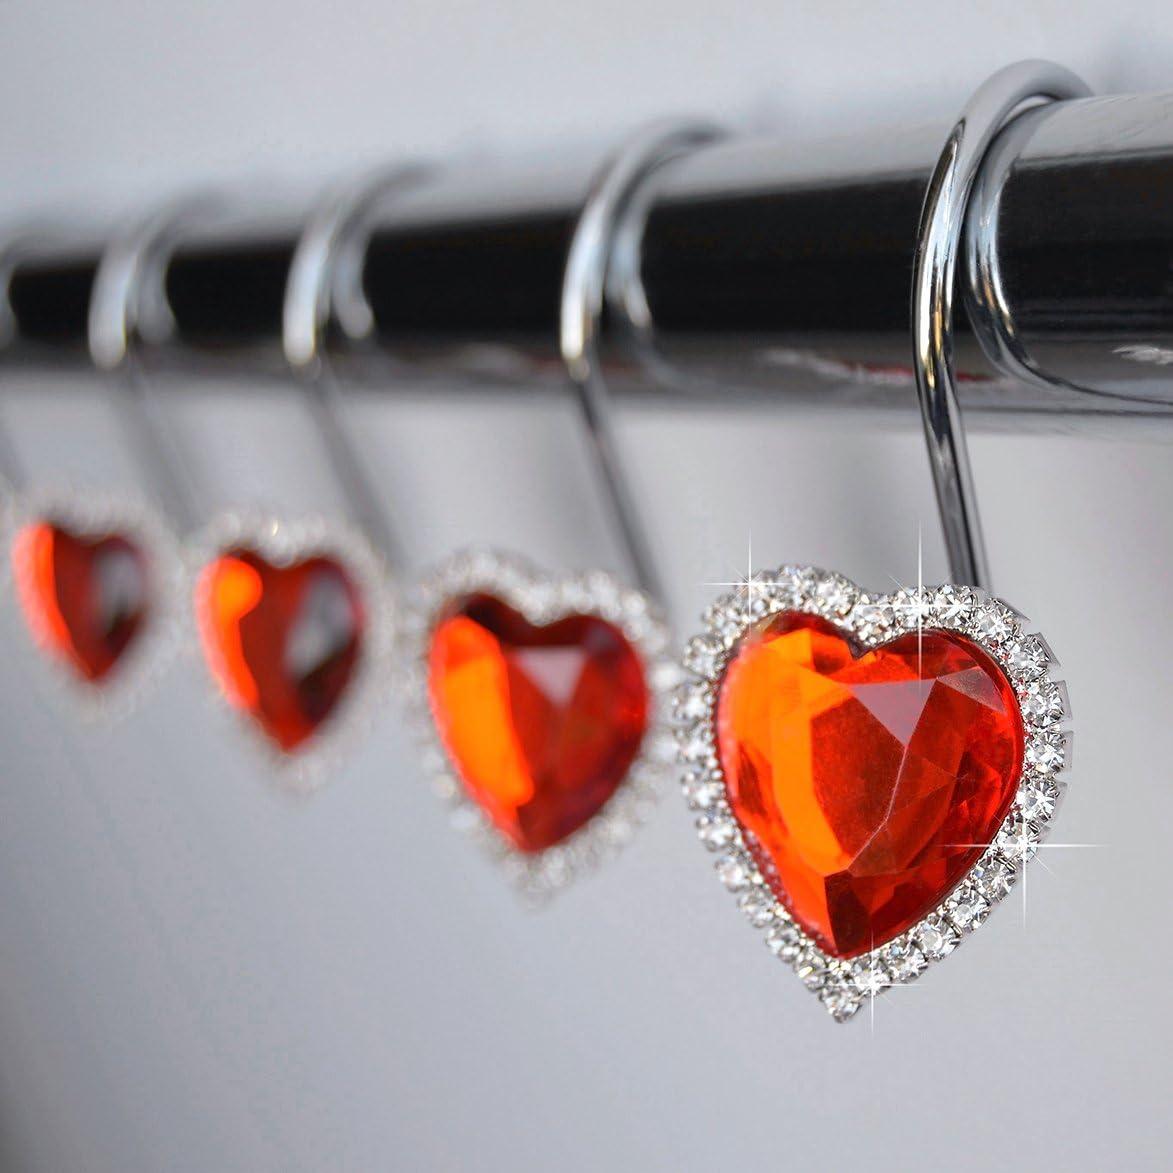 Heart Red Decorative Crystal Diamond Bling Rhinestones Bathroom Bath Set Love Valentine Gift Red American Cuteness Shower Curtain Hooks Rings